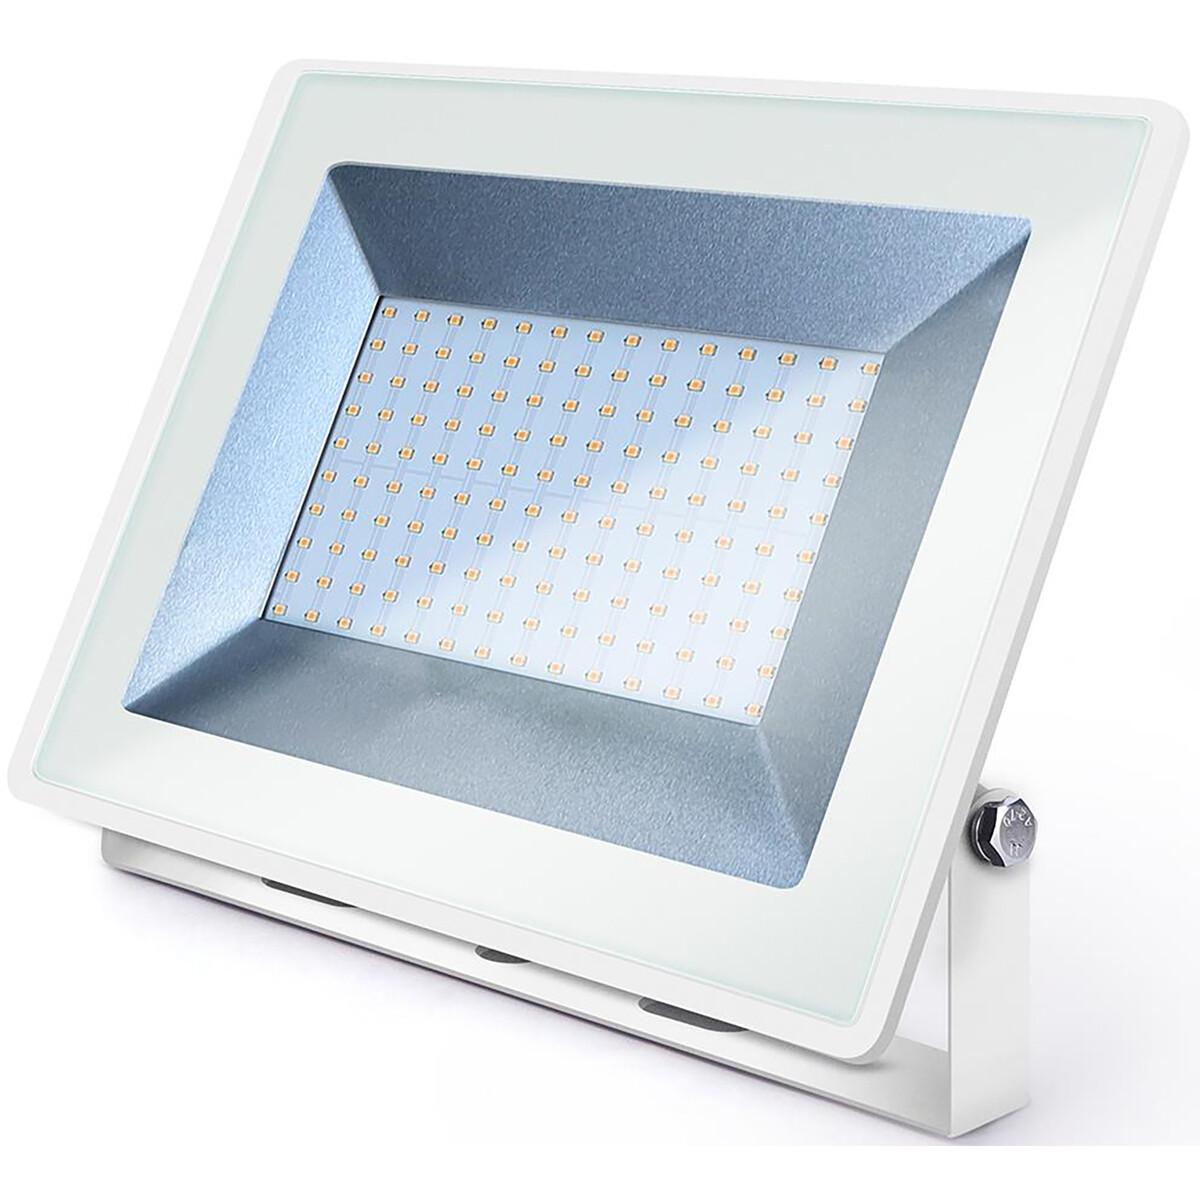 LED Bouwlamp 100 Watt - LED Schijnwerper - Aigi Iglo - Natuurlijk Wit 4000K - Waterdicht IP65 - Mat Wit - Aluminium